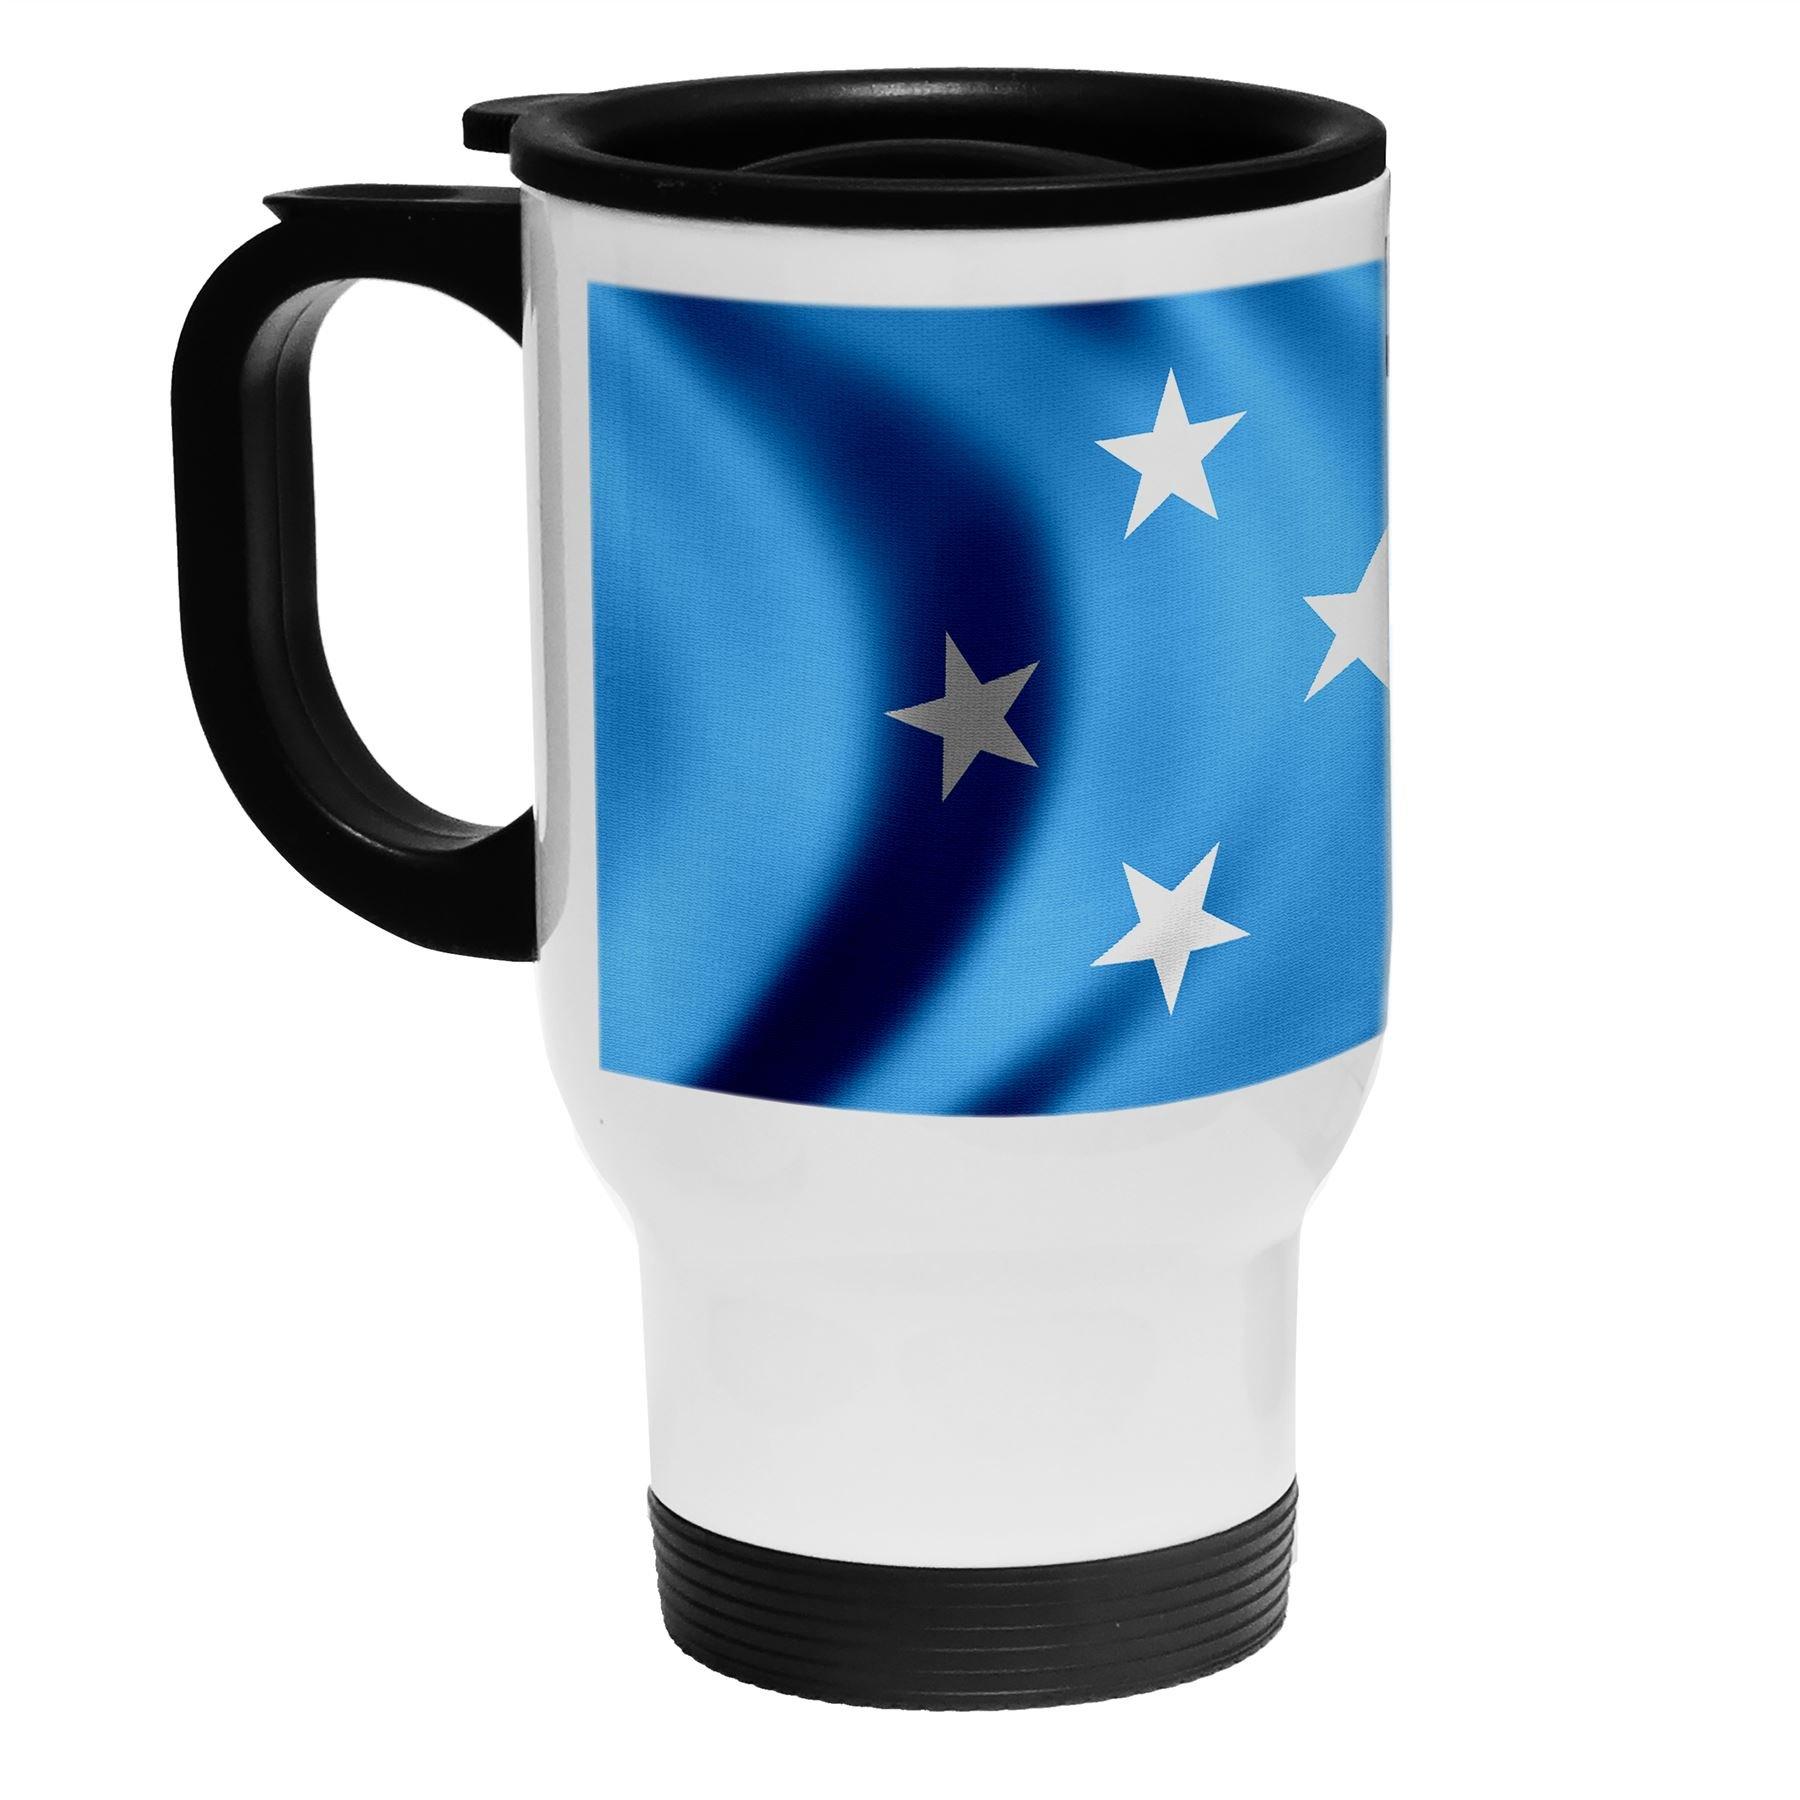 High Quality White Stainless Steel Coffee / Travel Mug - Flag of Micronesia (Micronesian) - Wood